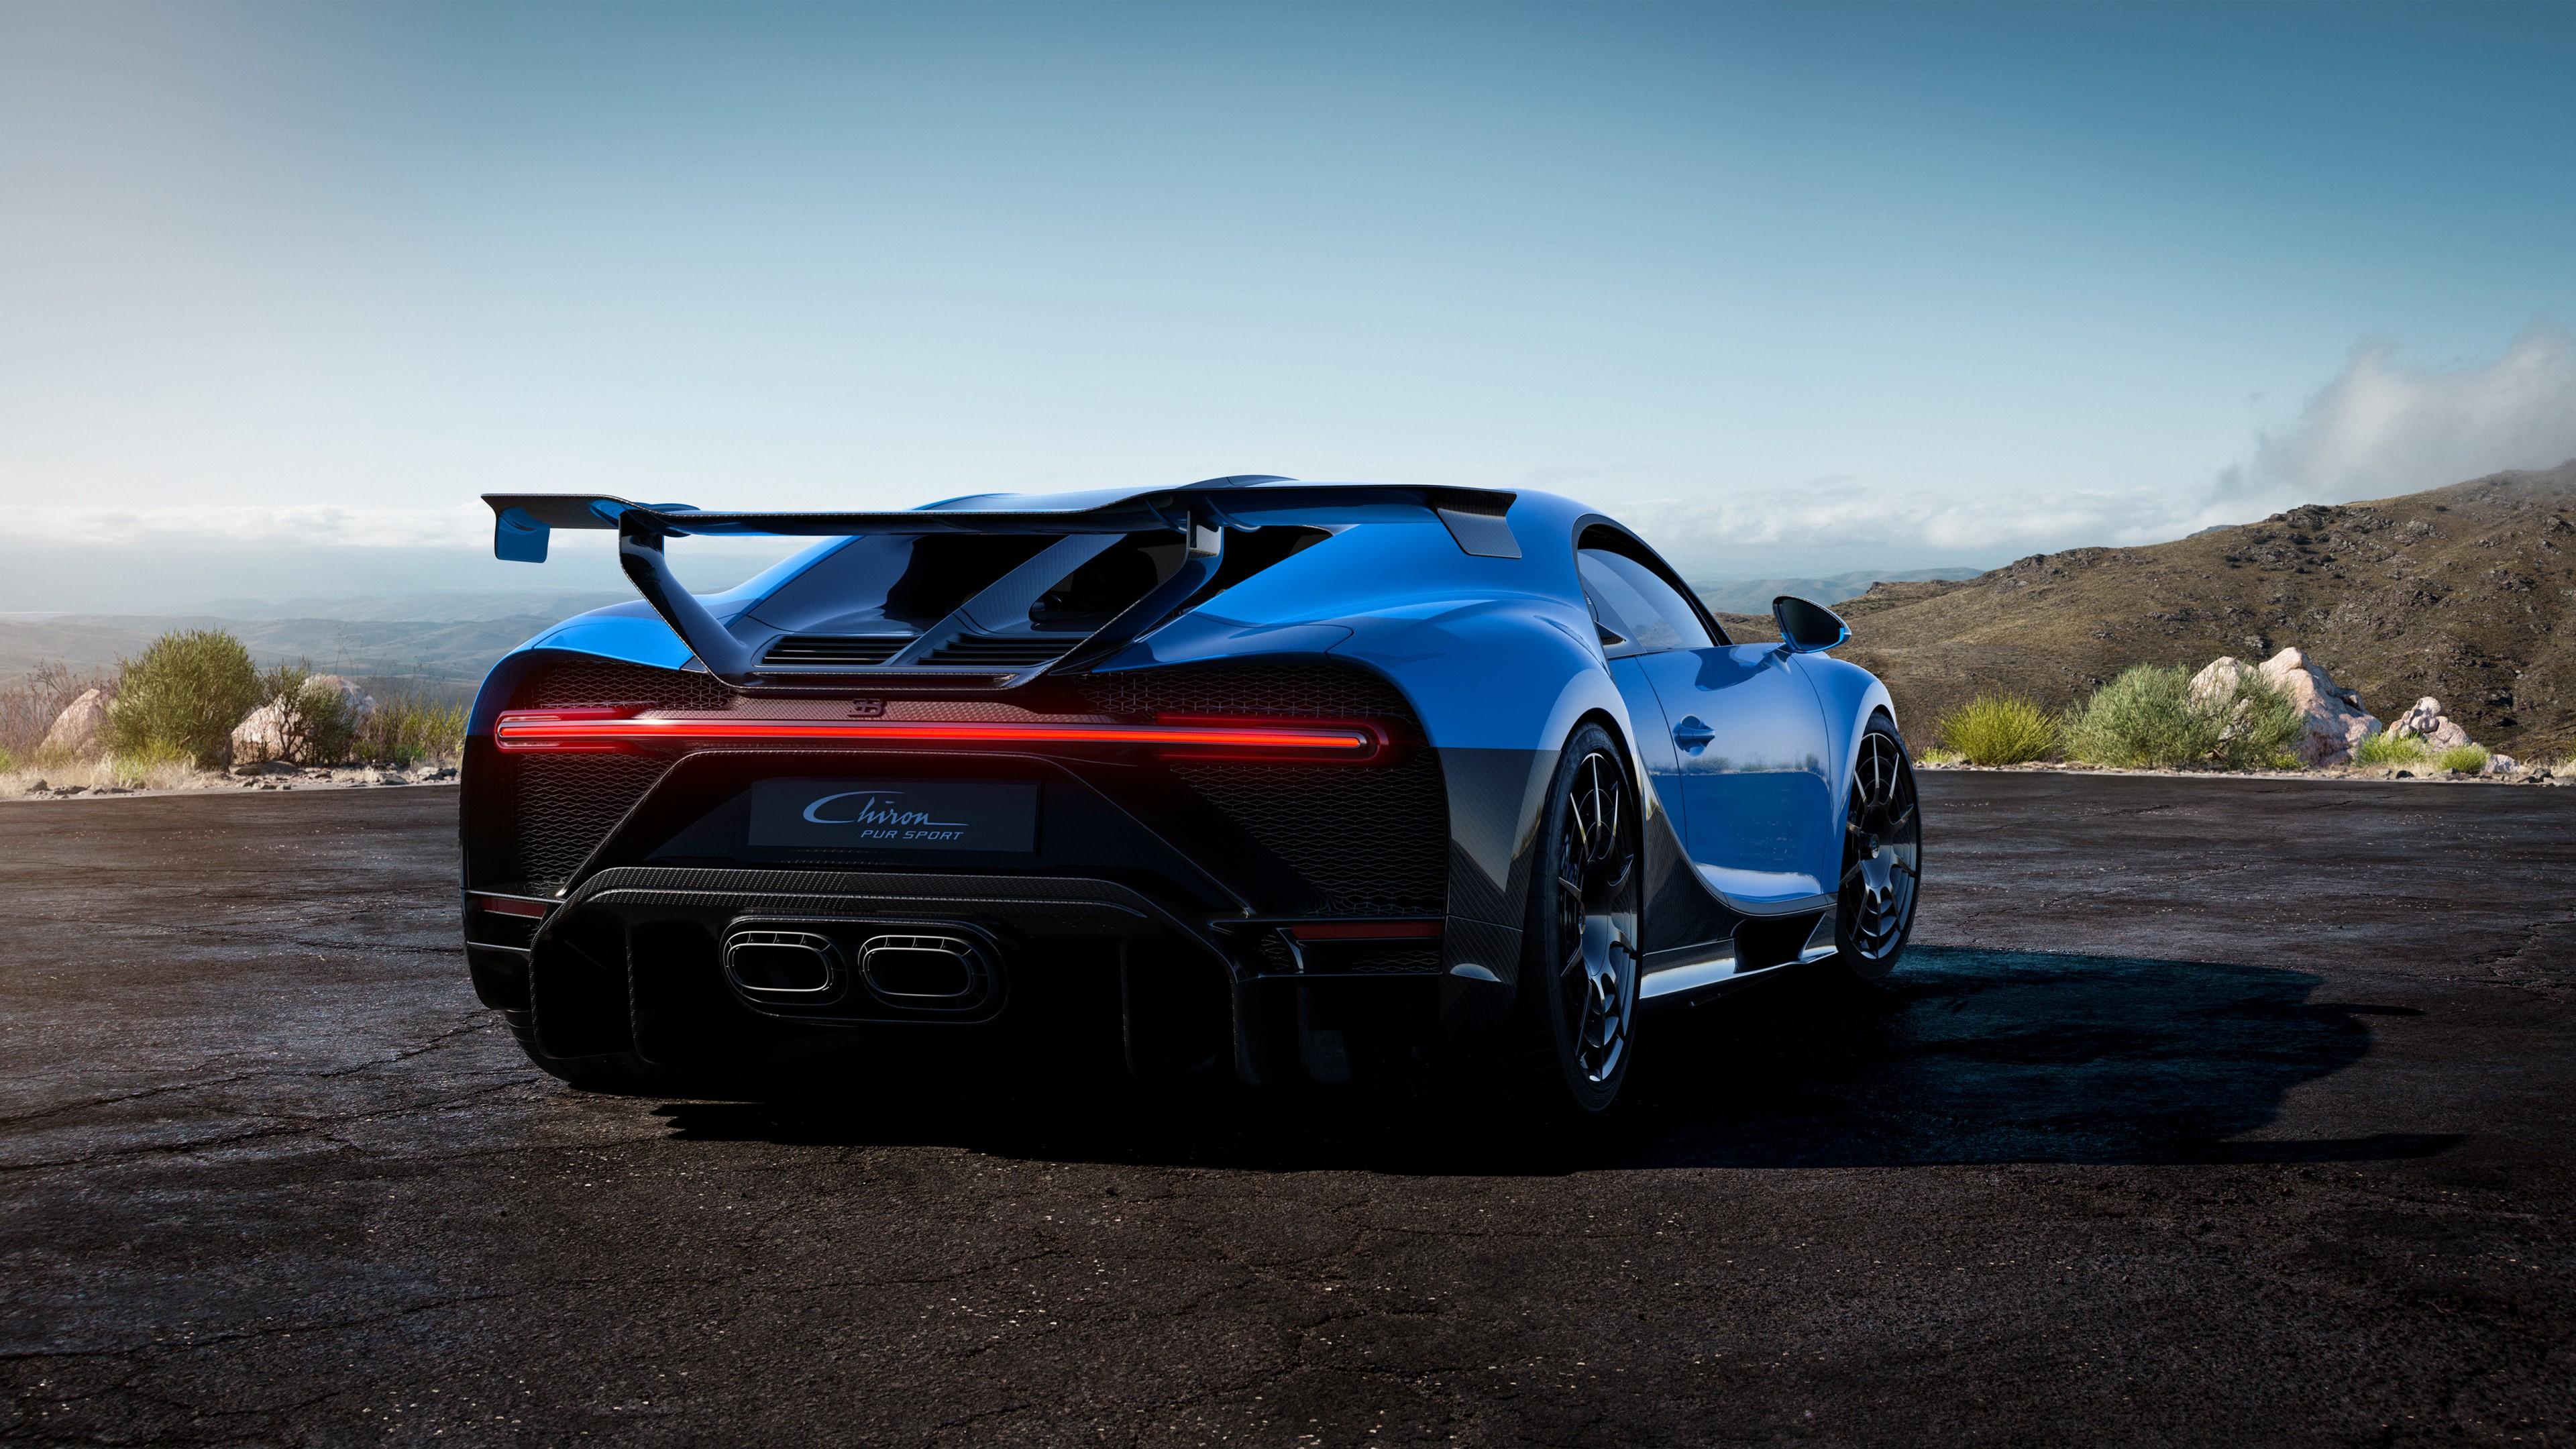 Bugatti Chiron Pur Sport 2020 5K 4 Wallpaper   HD Car ...